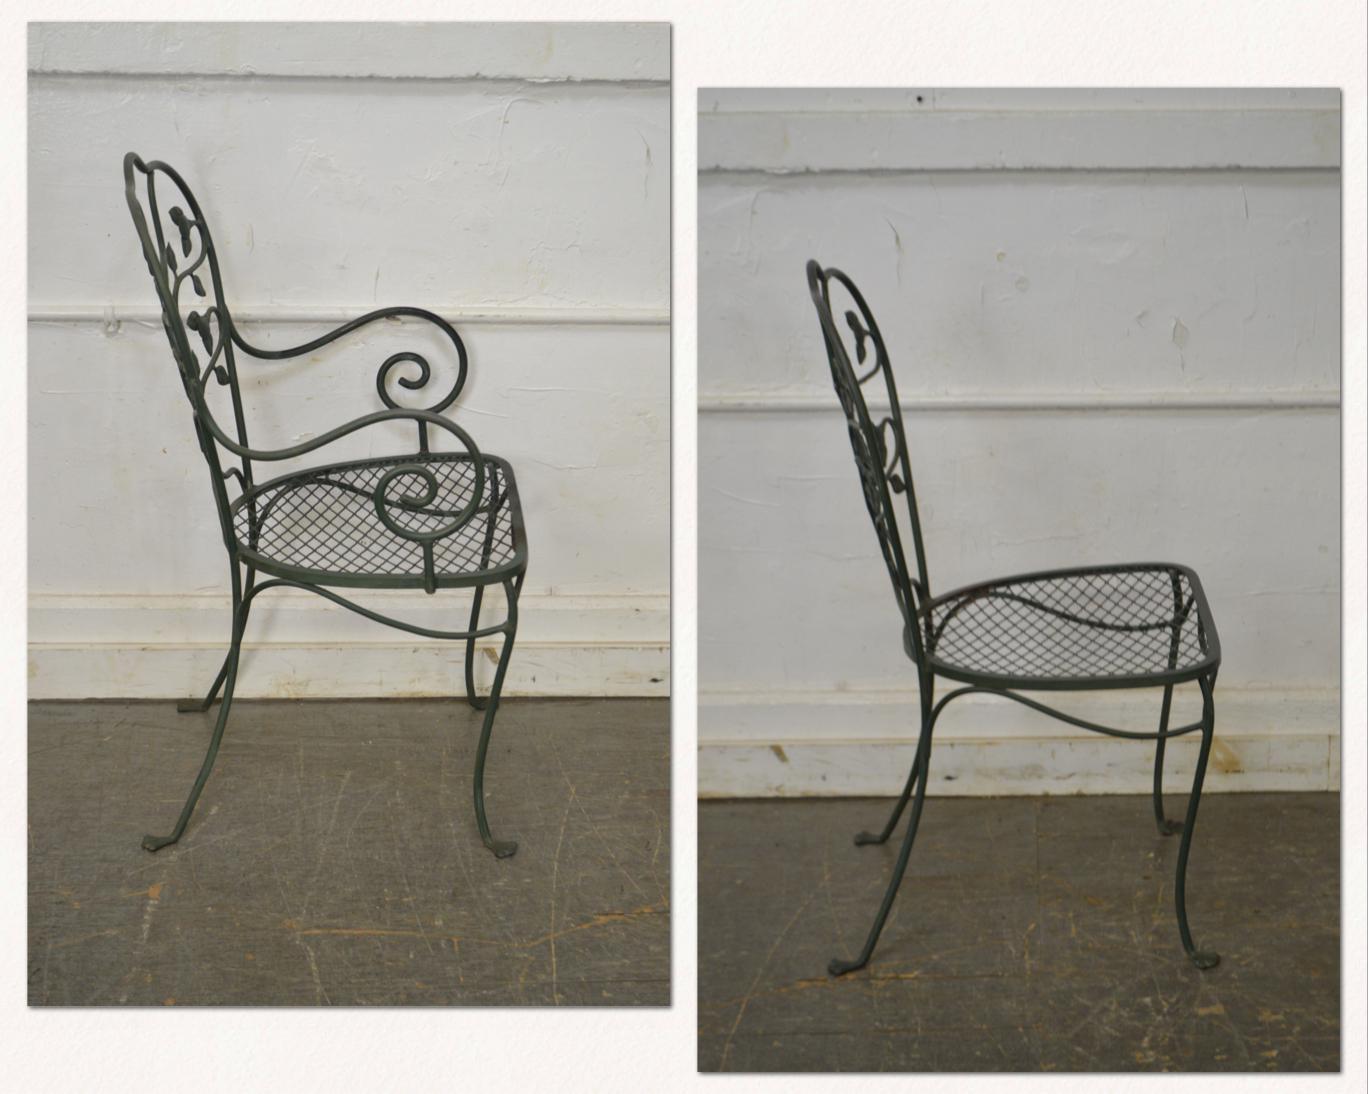 salterini wrought iron furniture. Salterini Wrought Iron Furniture. Ivy Pattern Patio Dining Chairs - Set Of Furniture